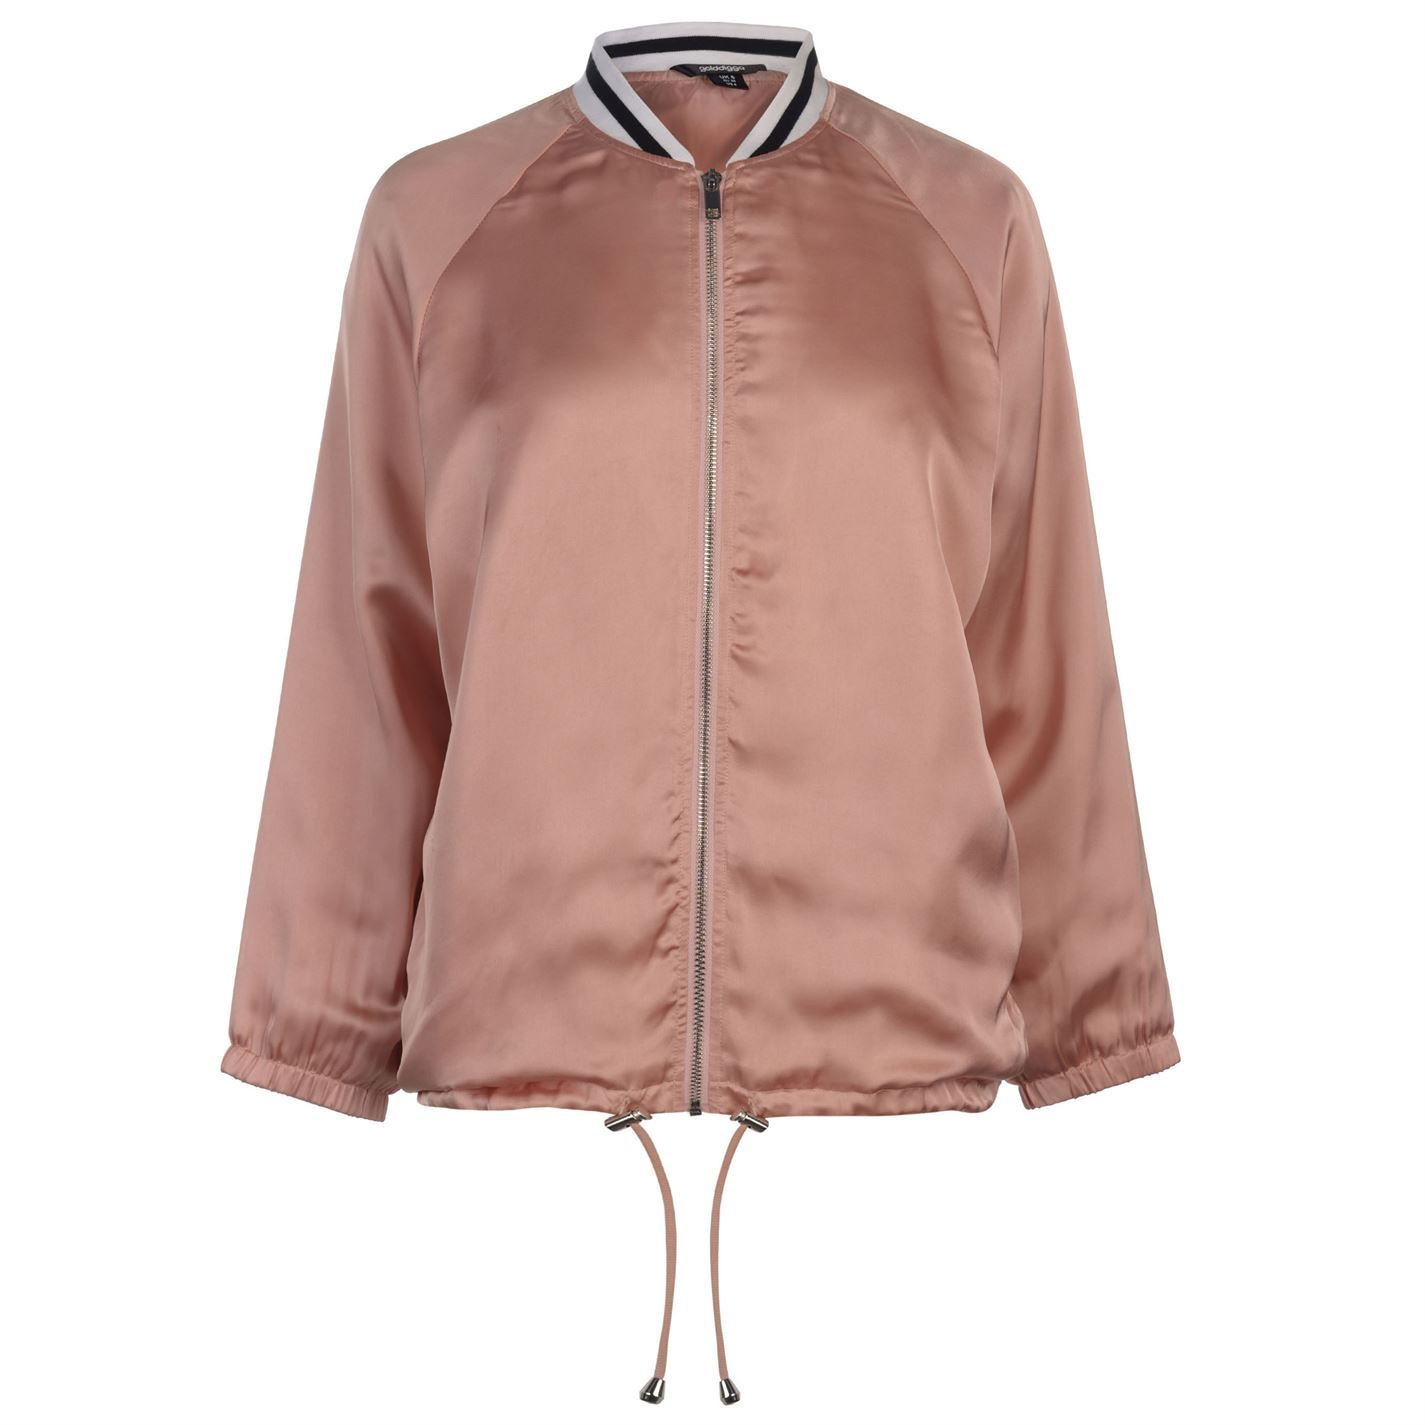 Golddigga-Bomber-Jacket-Womens-Coats-Outerwear thumbnail 10